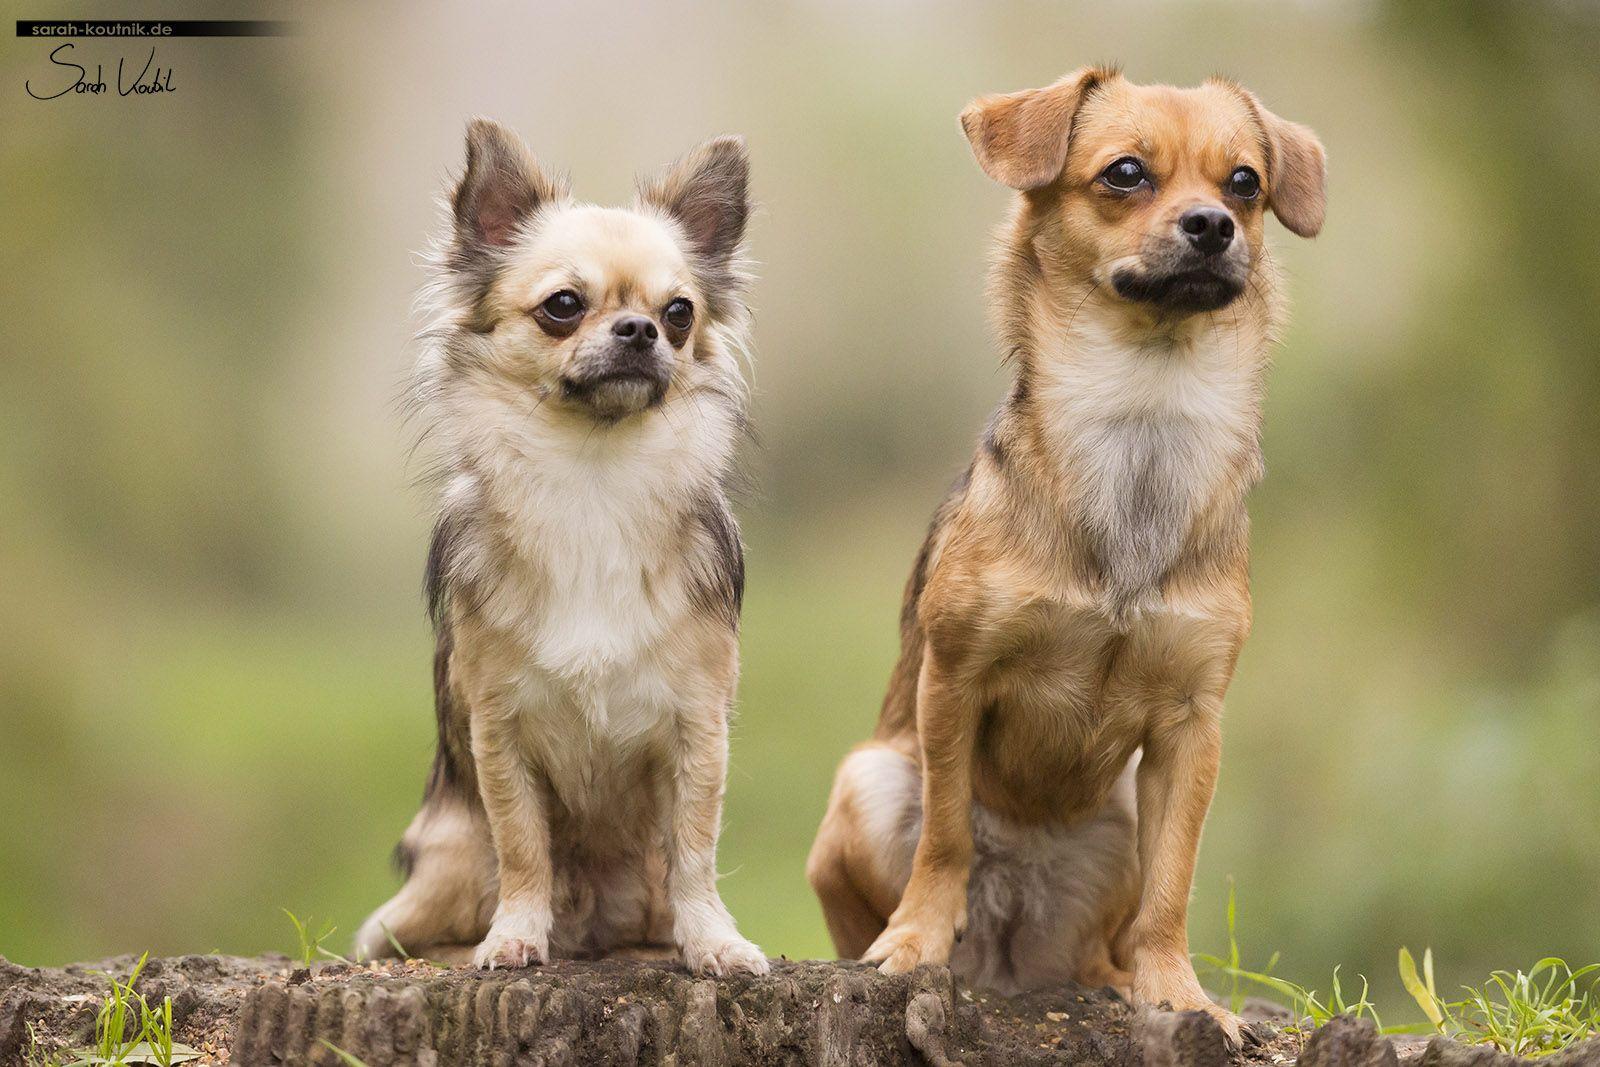 Noel Und Gismo Grosse Charaktare In Kleinen Hunden Chihuahua Hundefotos Kleine Hunde